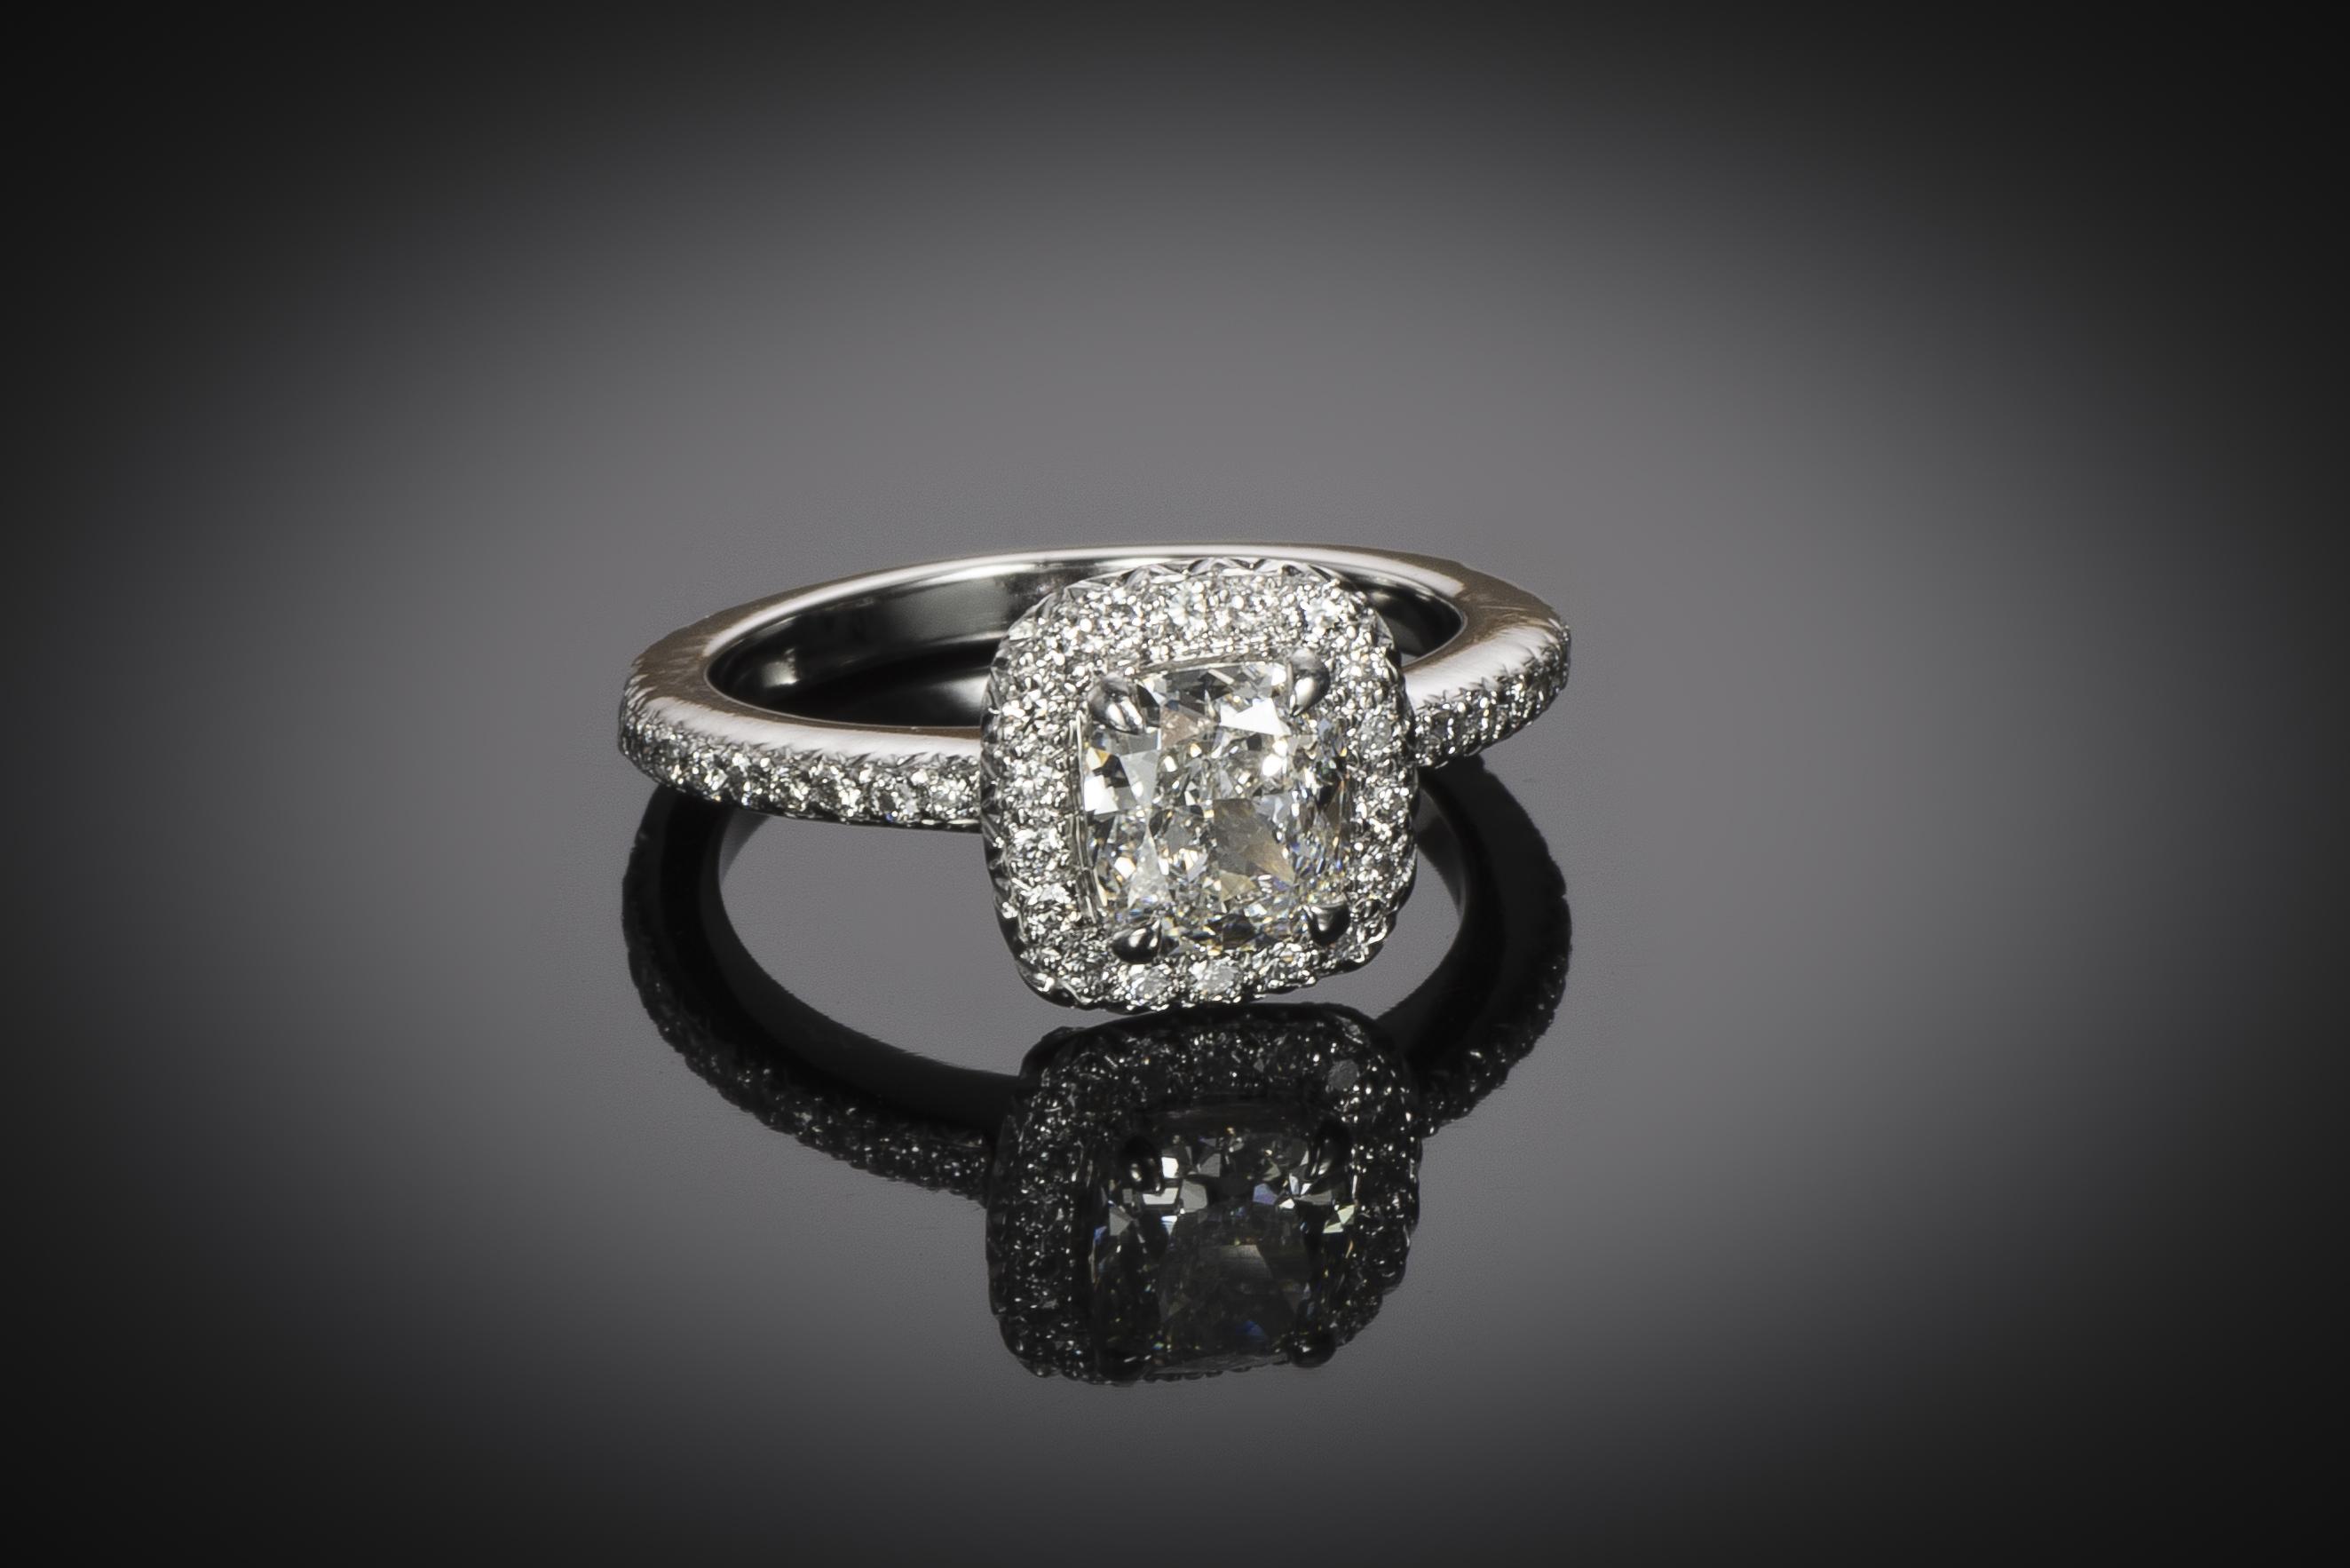 Bague diamant coussin 1,05 carat (certificat GIA – G VS1)-1